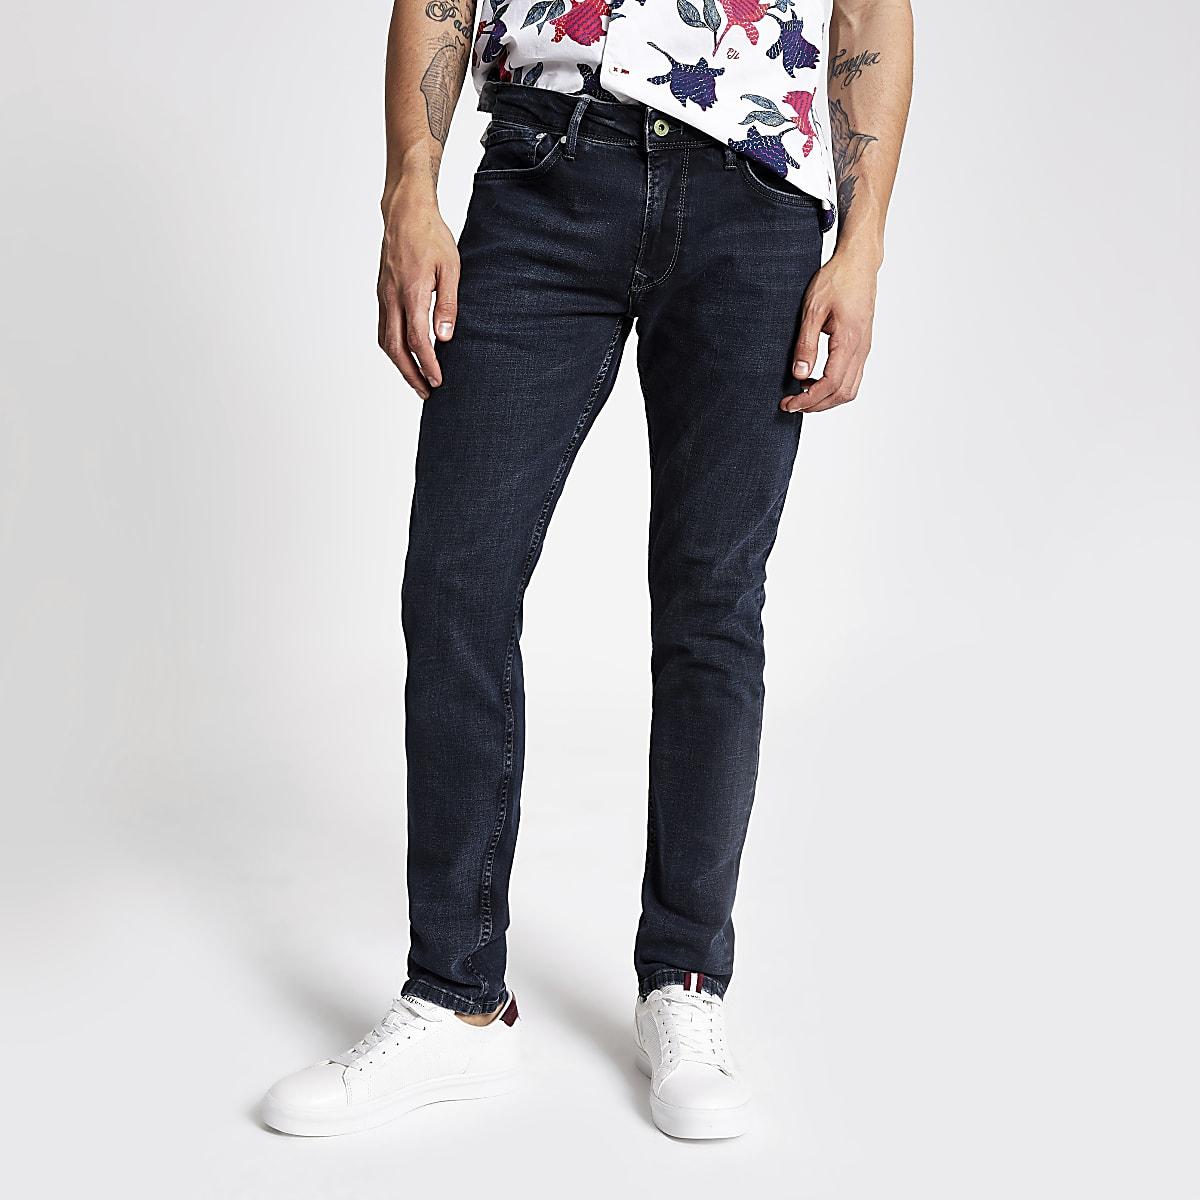 Pepe Jeans – Jean skinny bleu noir